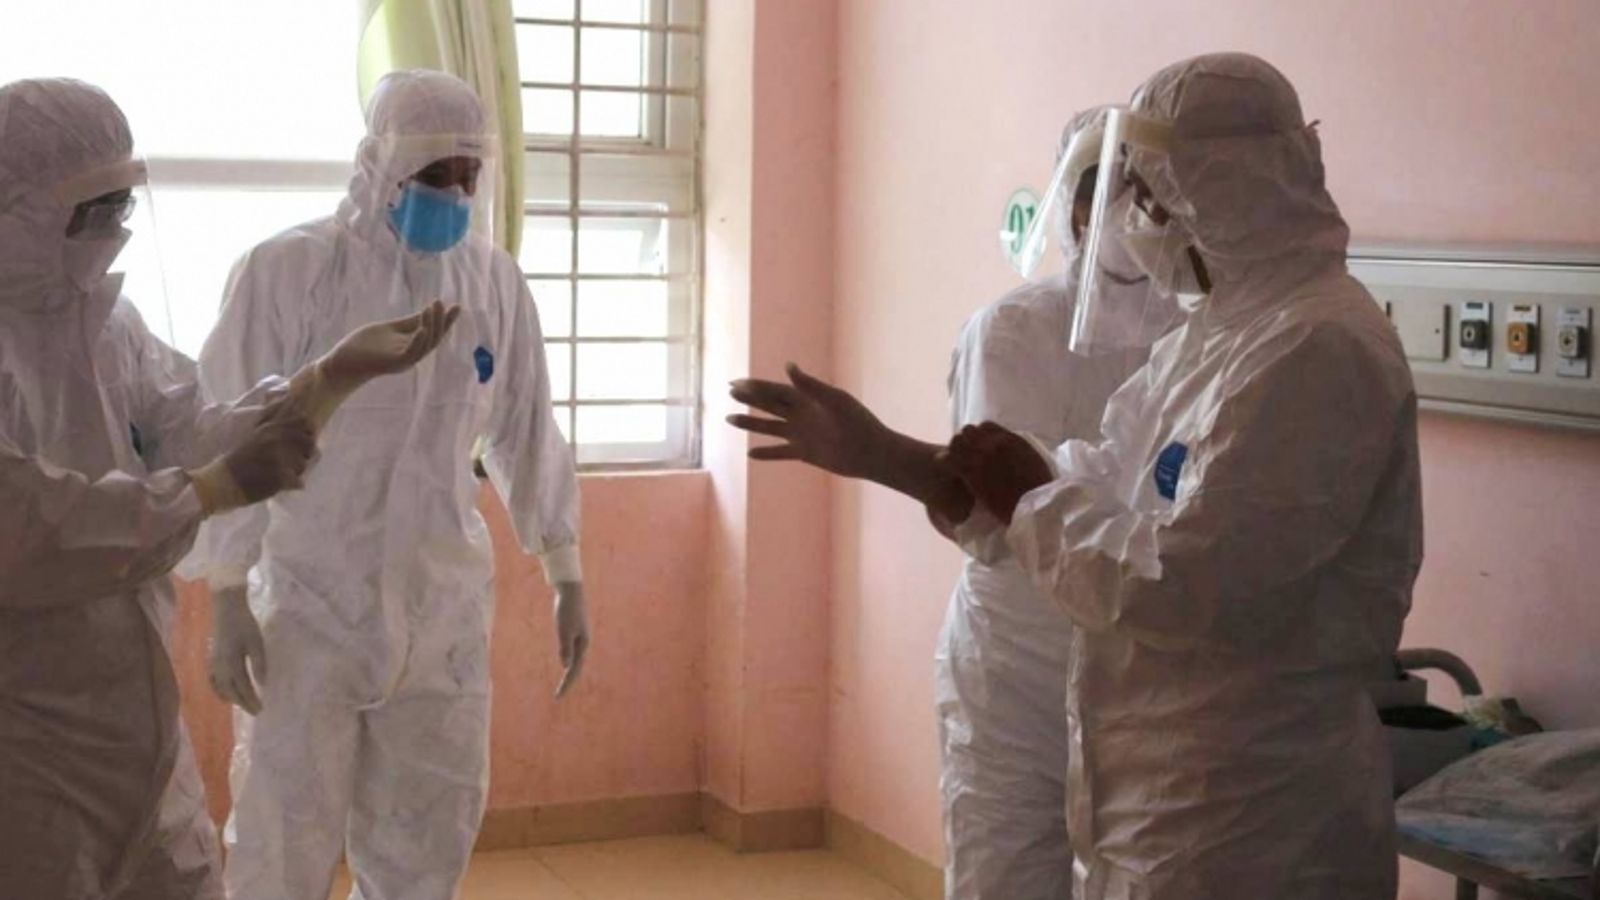 Border locality upgrades field hospital amid COVID-19 fears